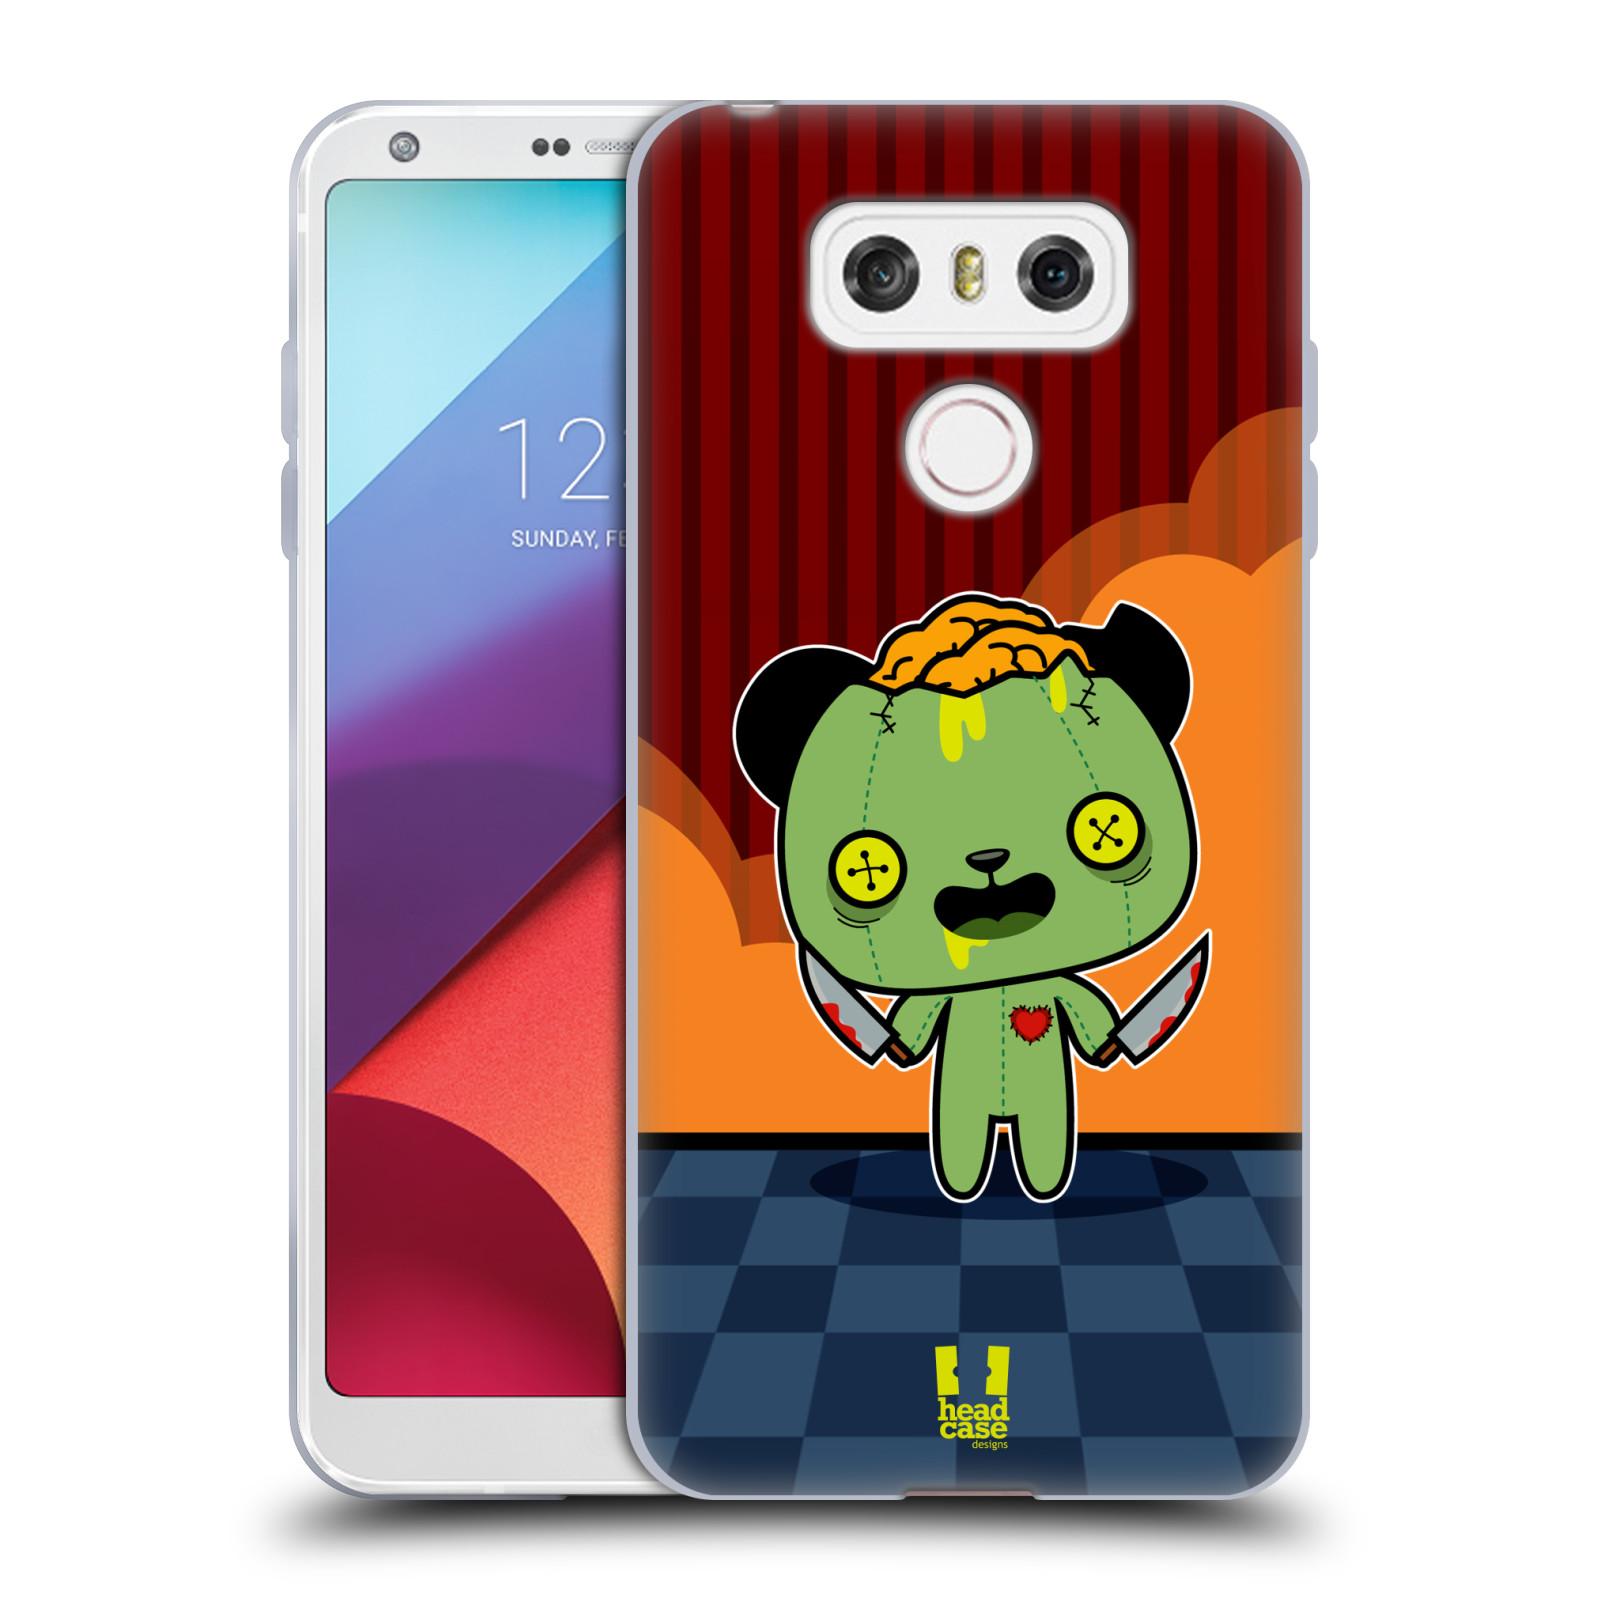 Silikonové pouzdro na mobil LG G6 - Head Case ZOMBIE PANDA (Silikonový kryt či obal na mobilní telefon LG G6 H870 / LG G6 Dual SIM H870DS)